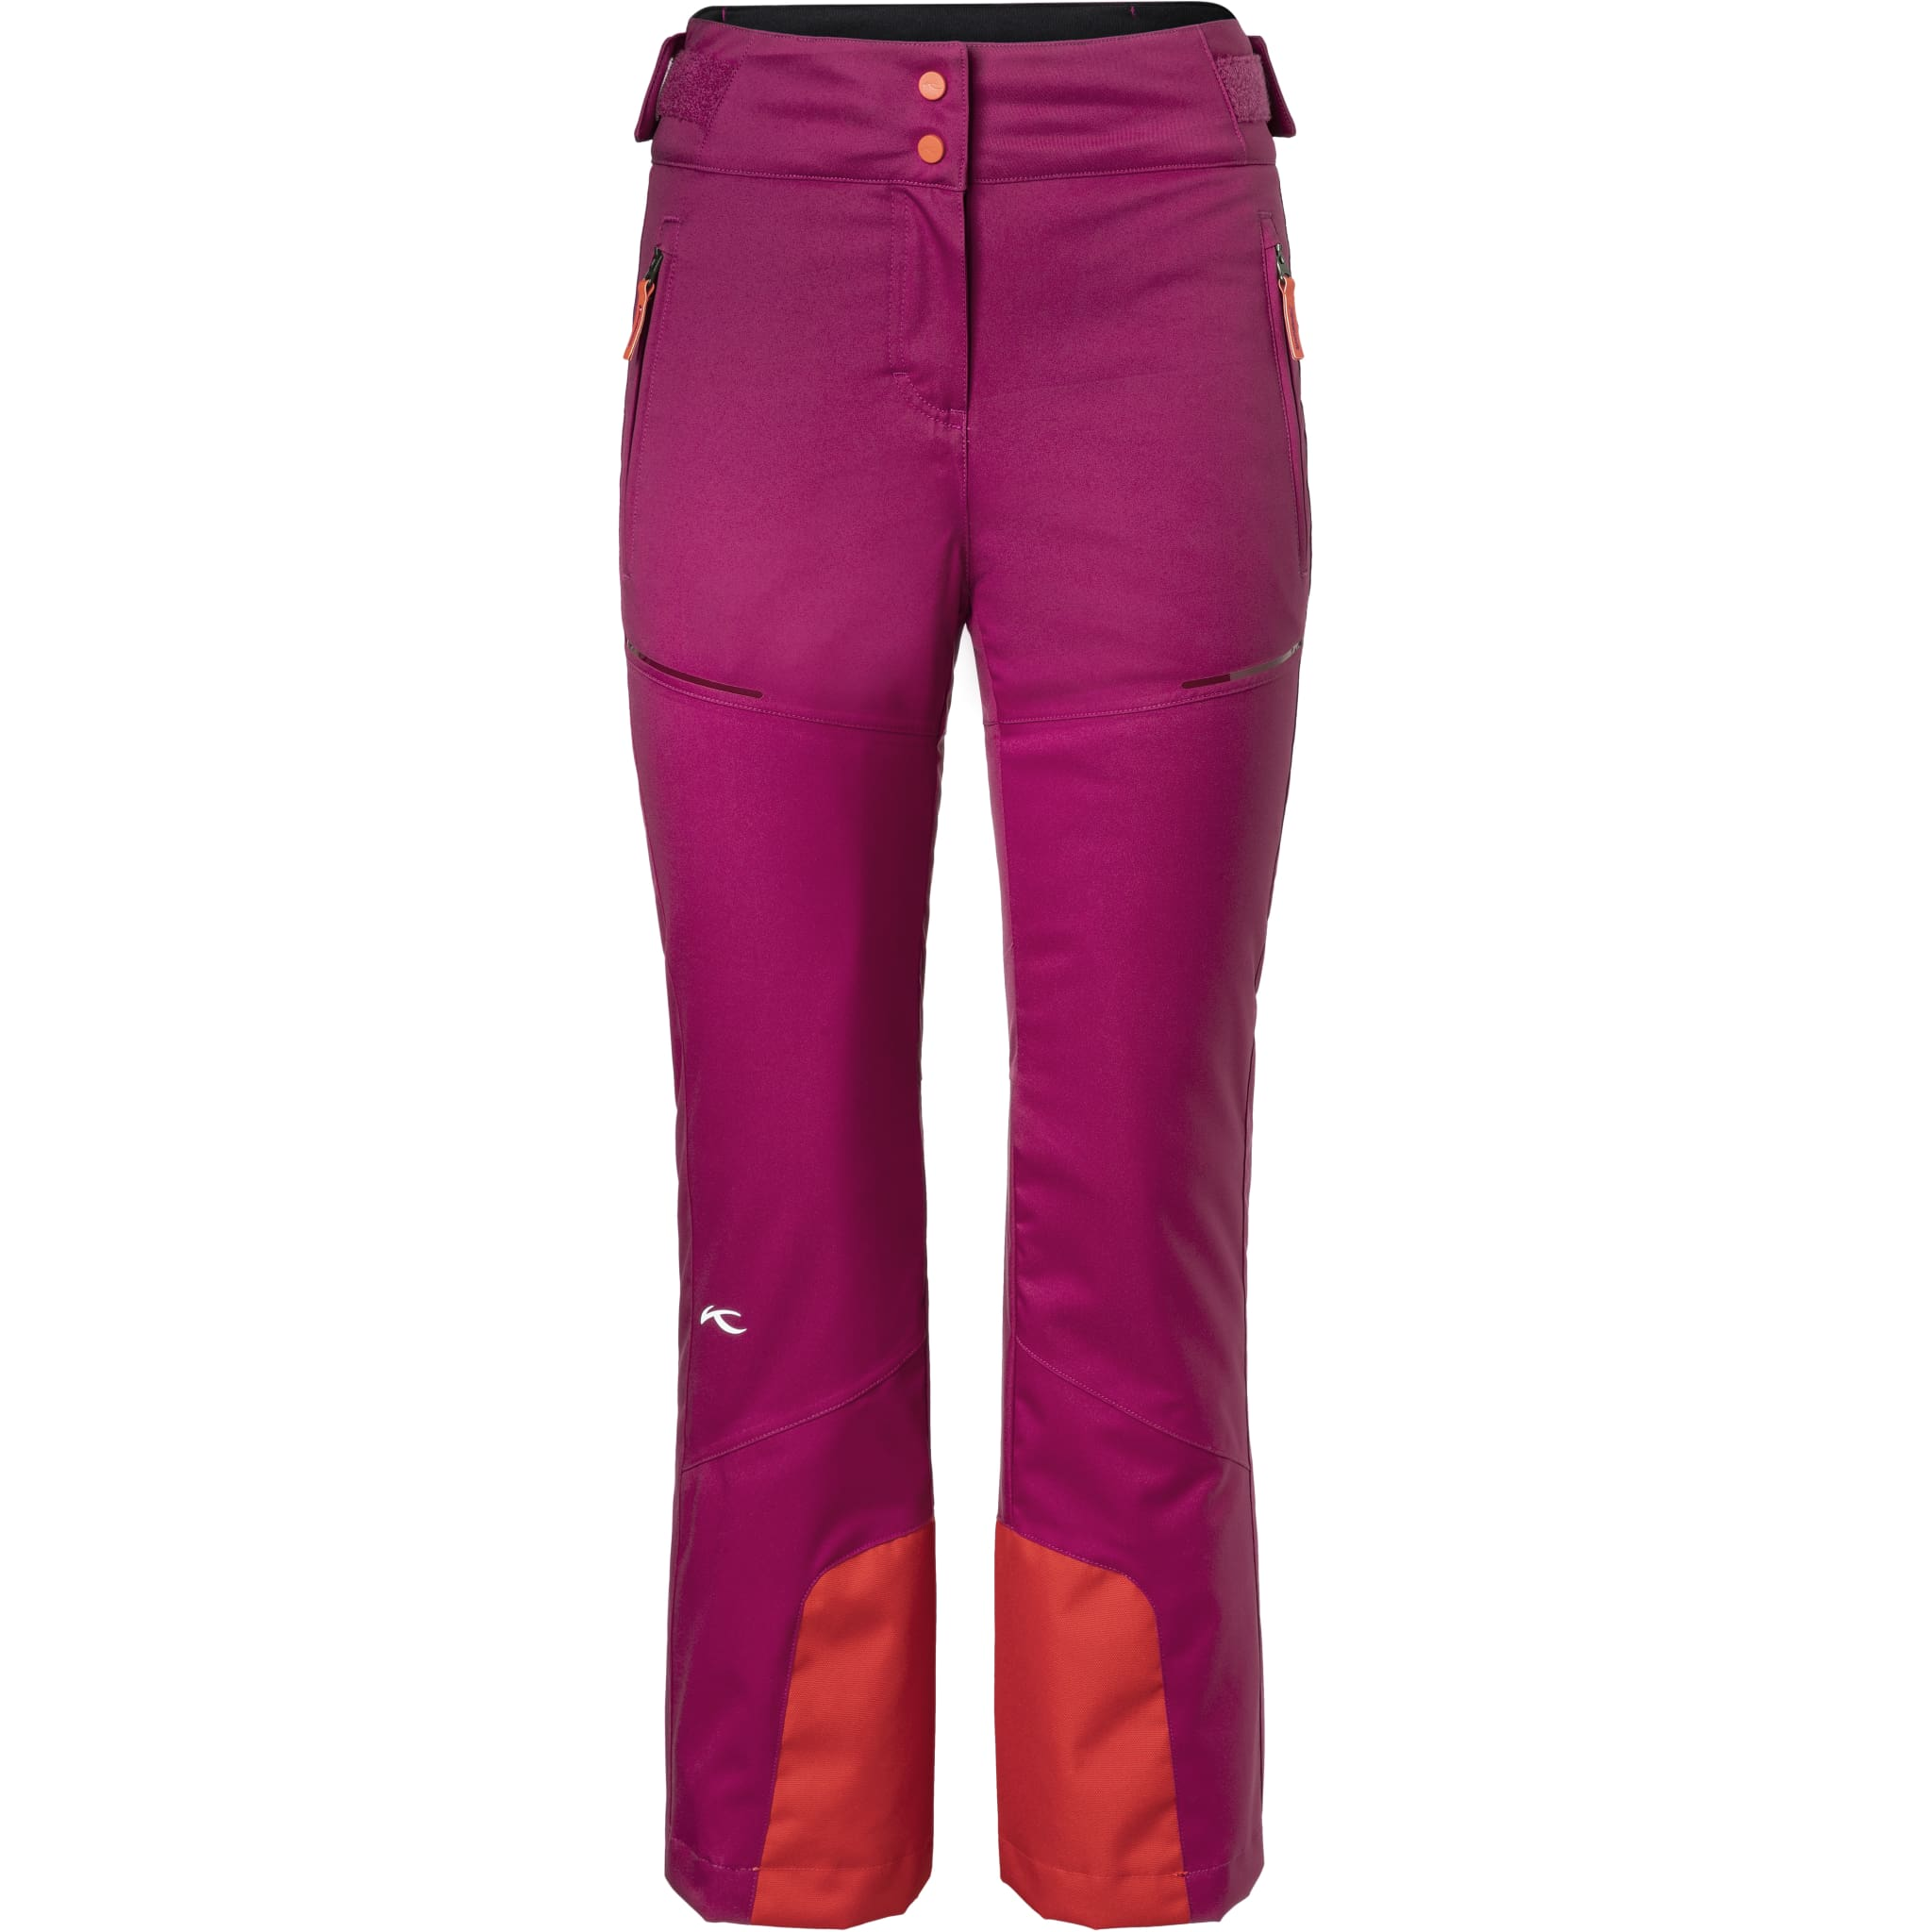 Carpa Pants Girls